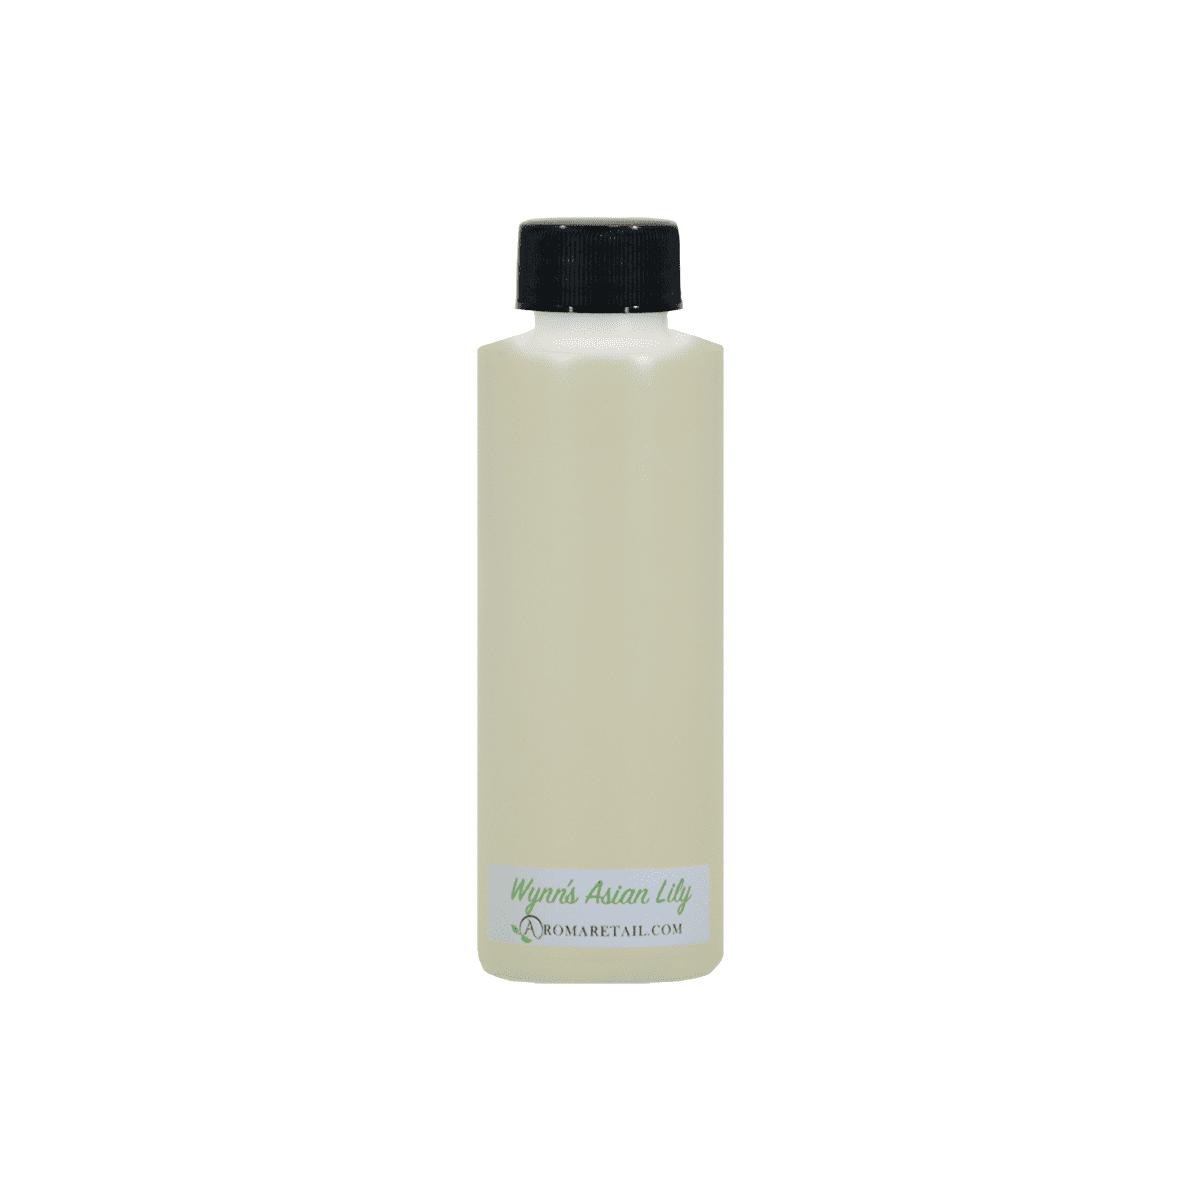 Asian Lily Fragrance Oil Experienced At Wynn Hotel 4oz Refill For Aroma Diffusion Machine Walmart Com Walmart Com